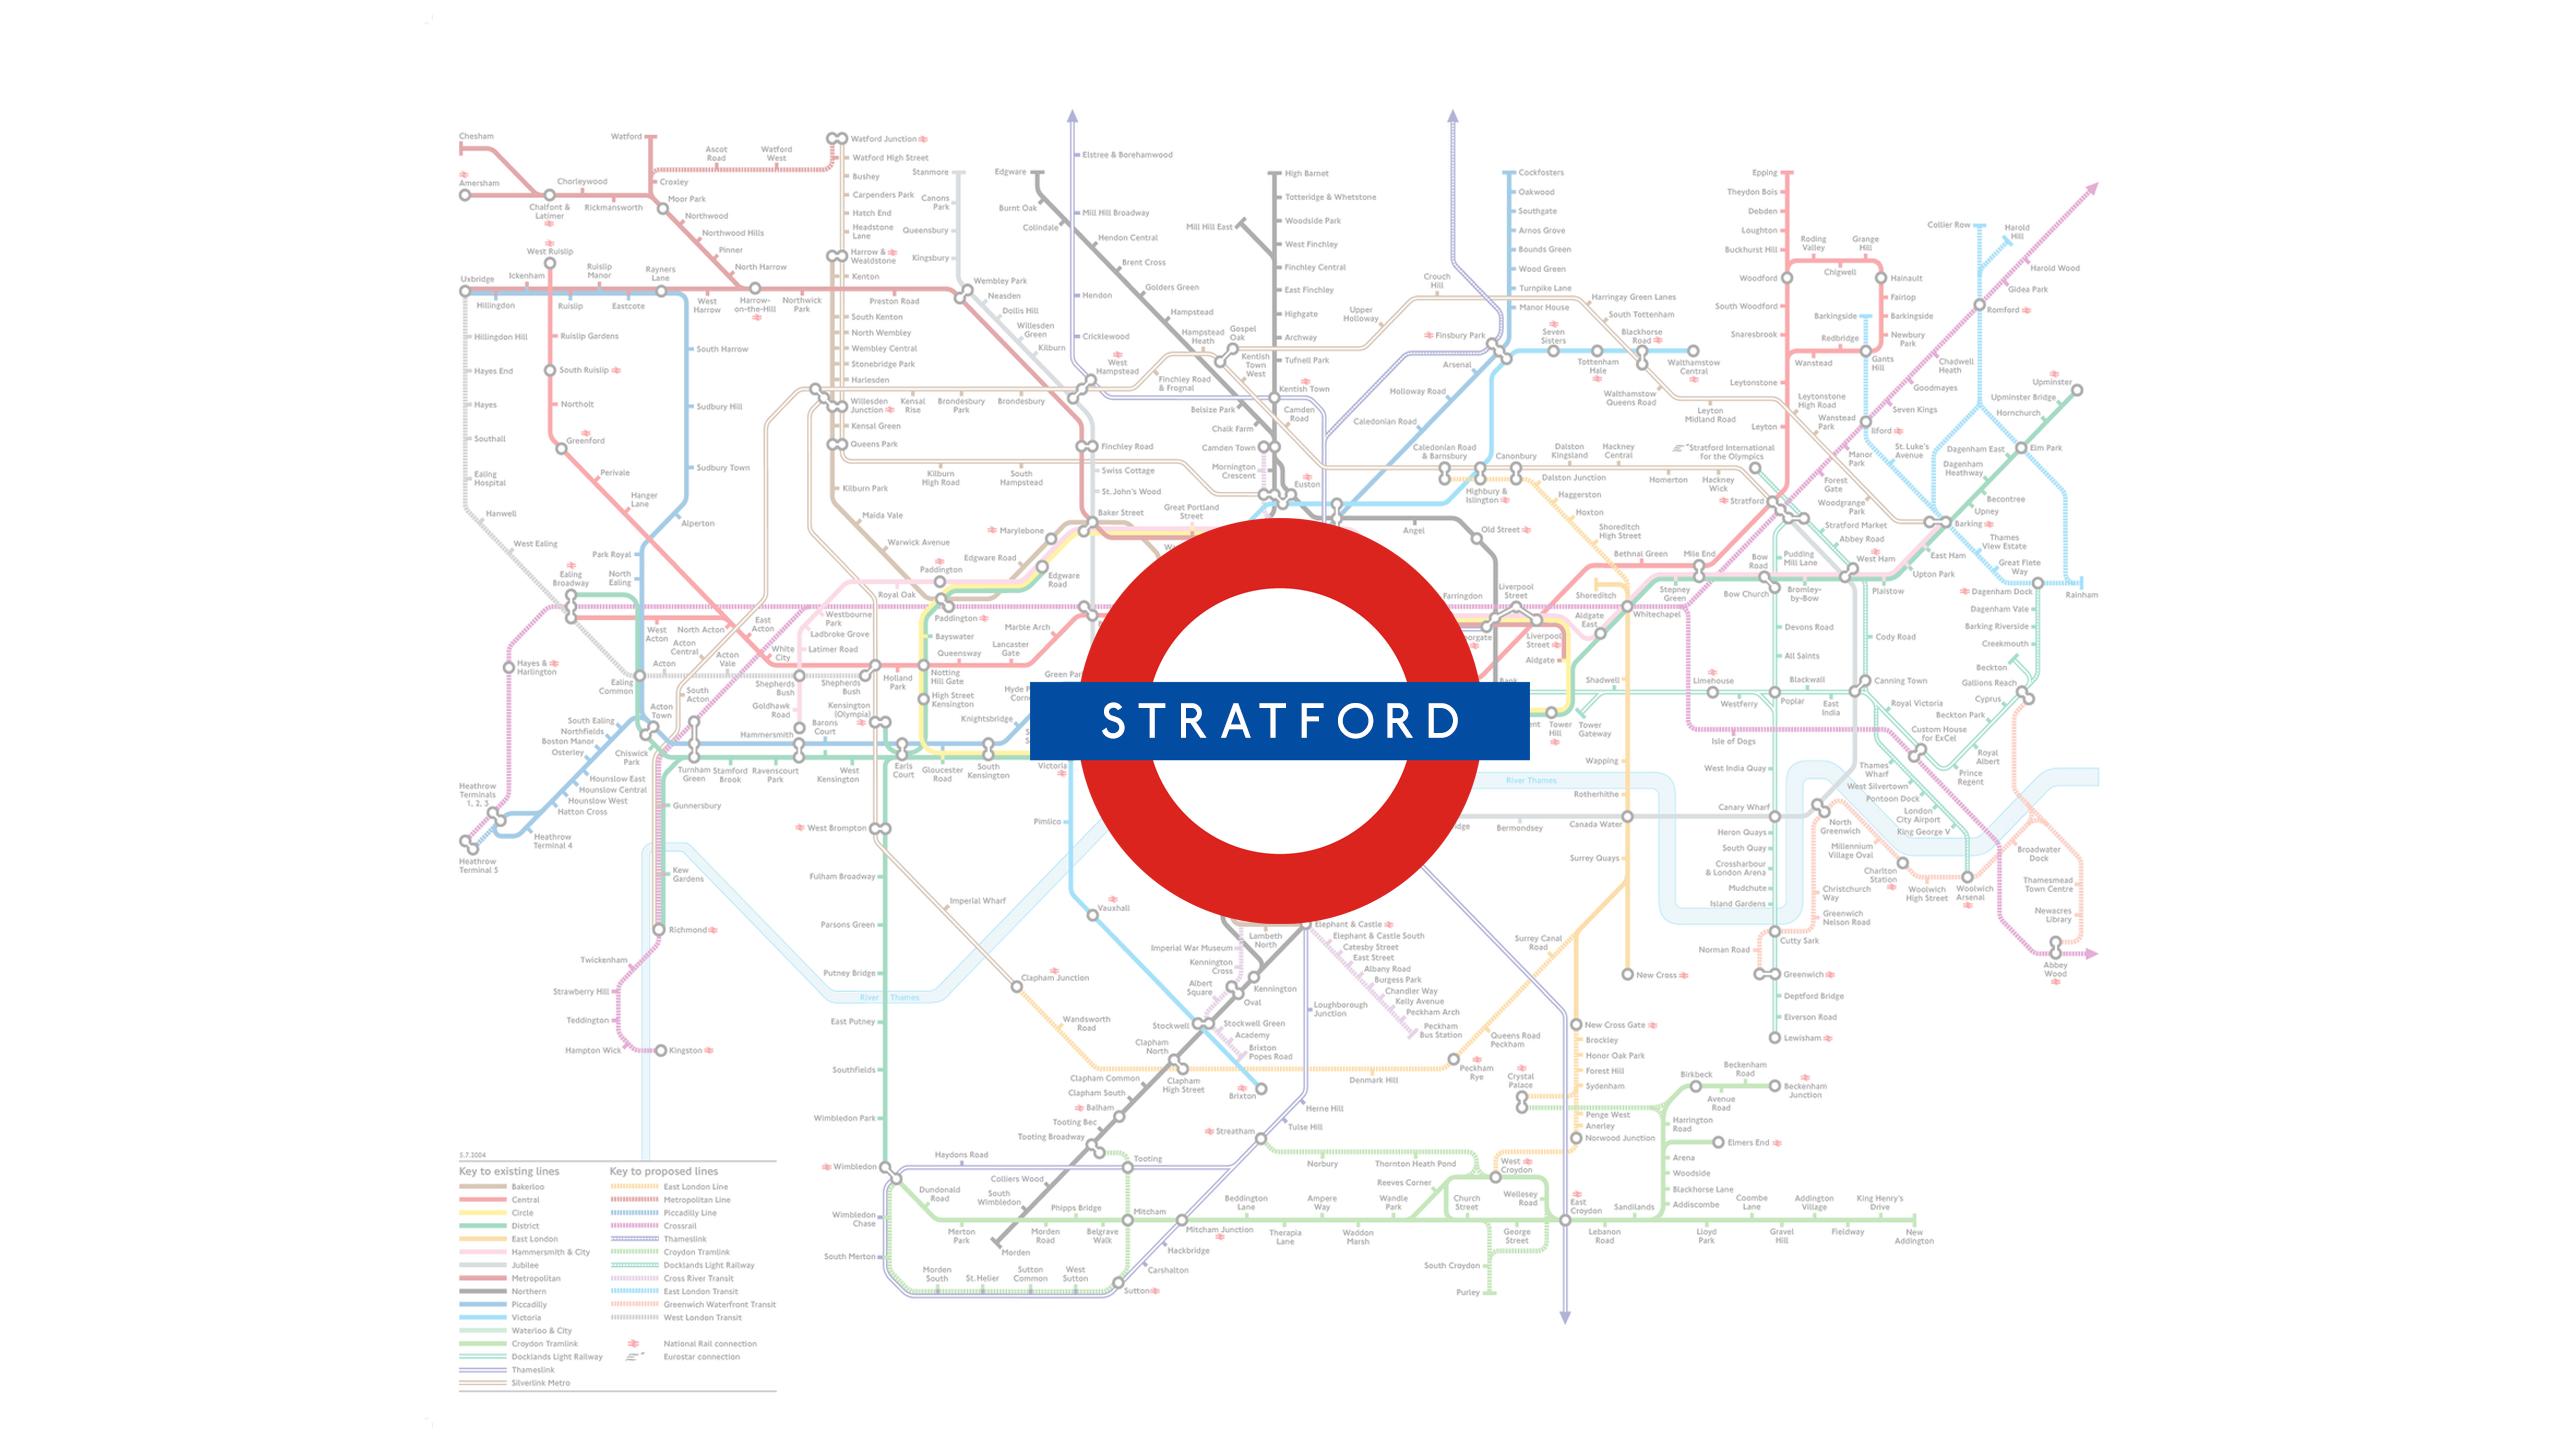 Stratford (Map)